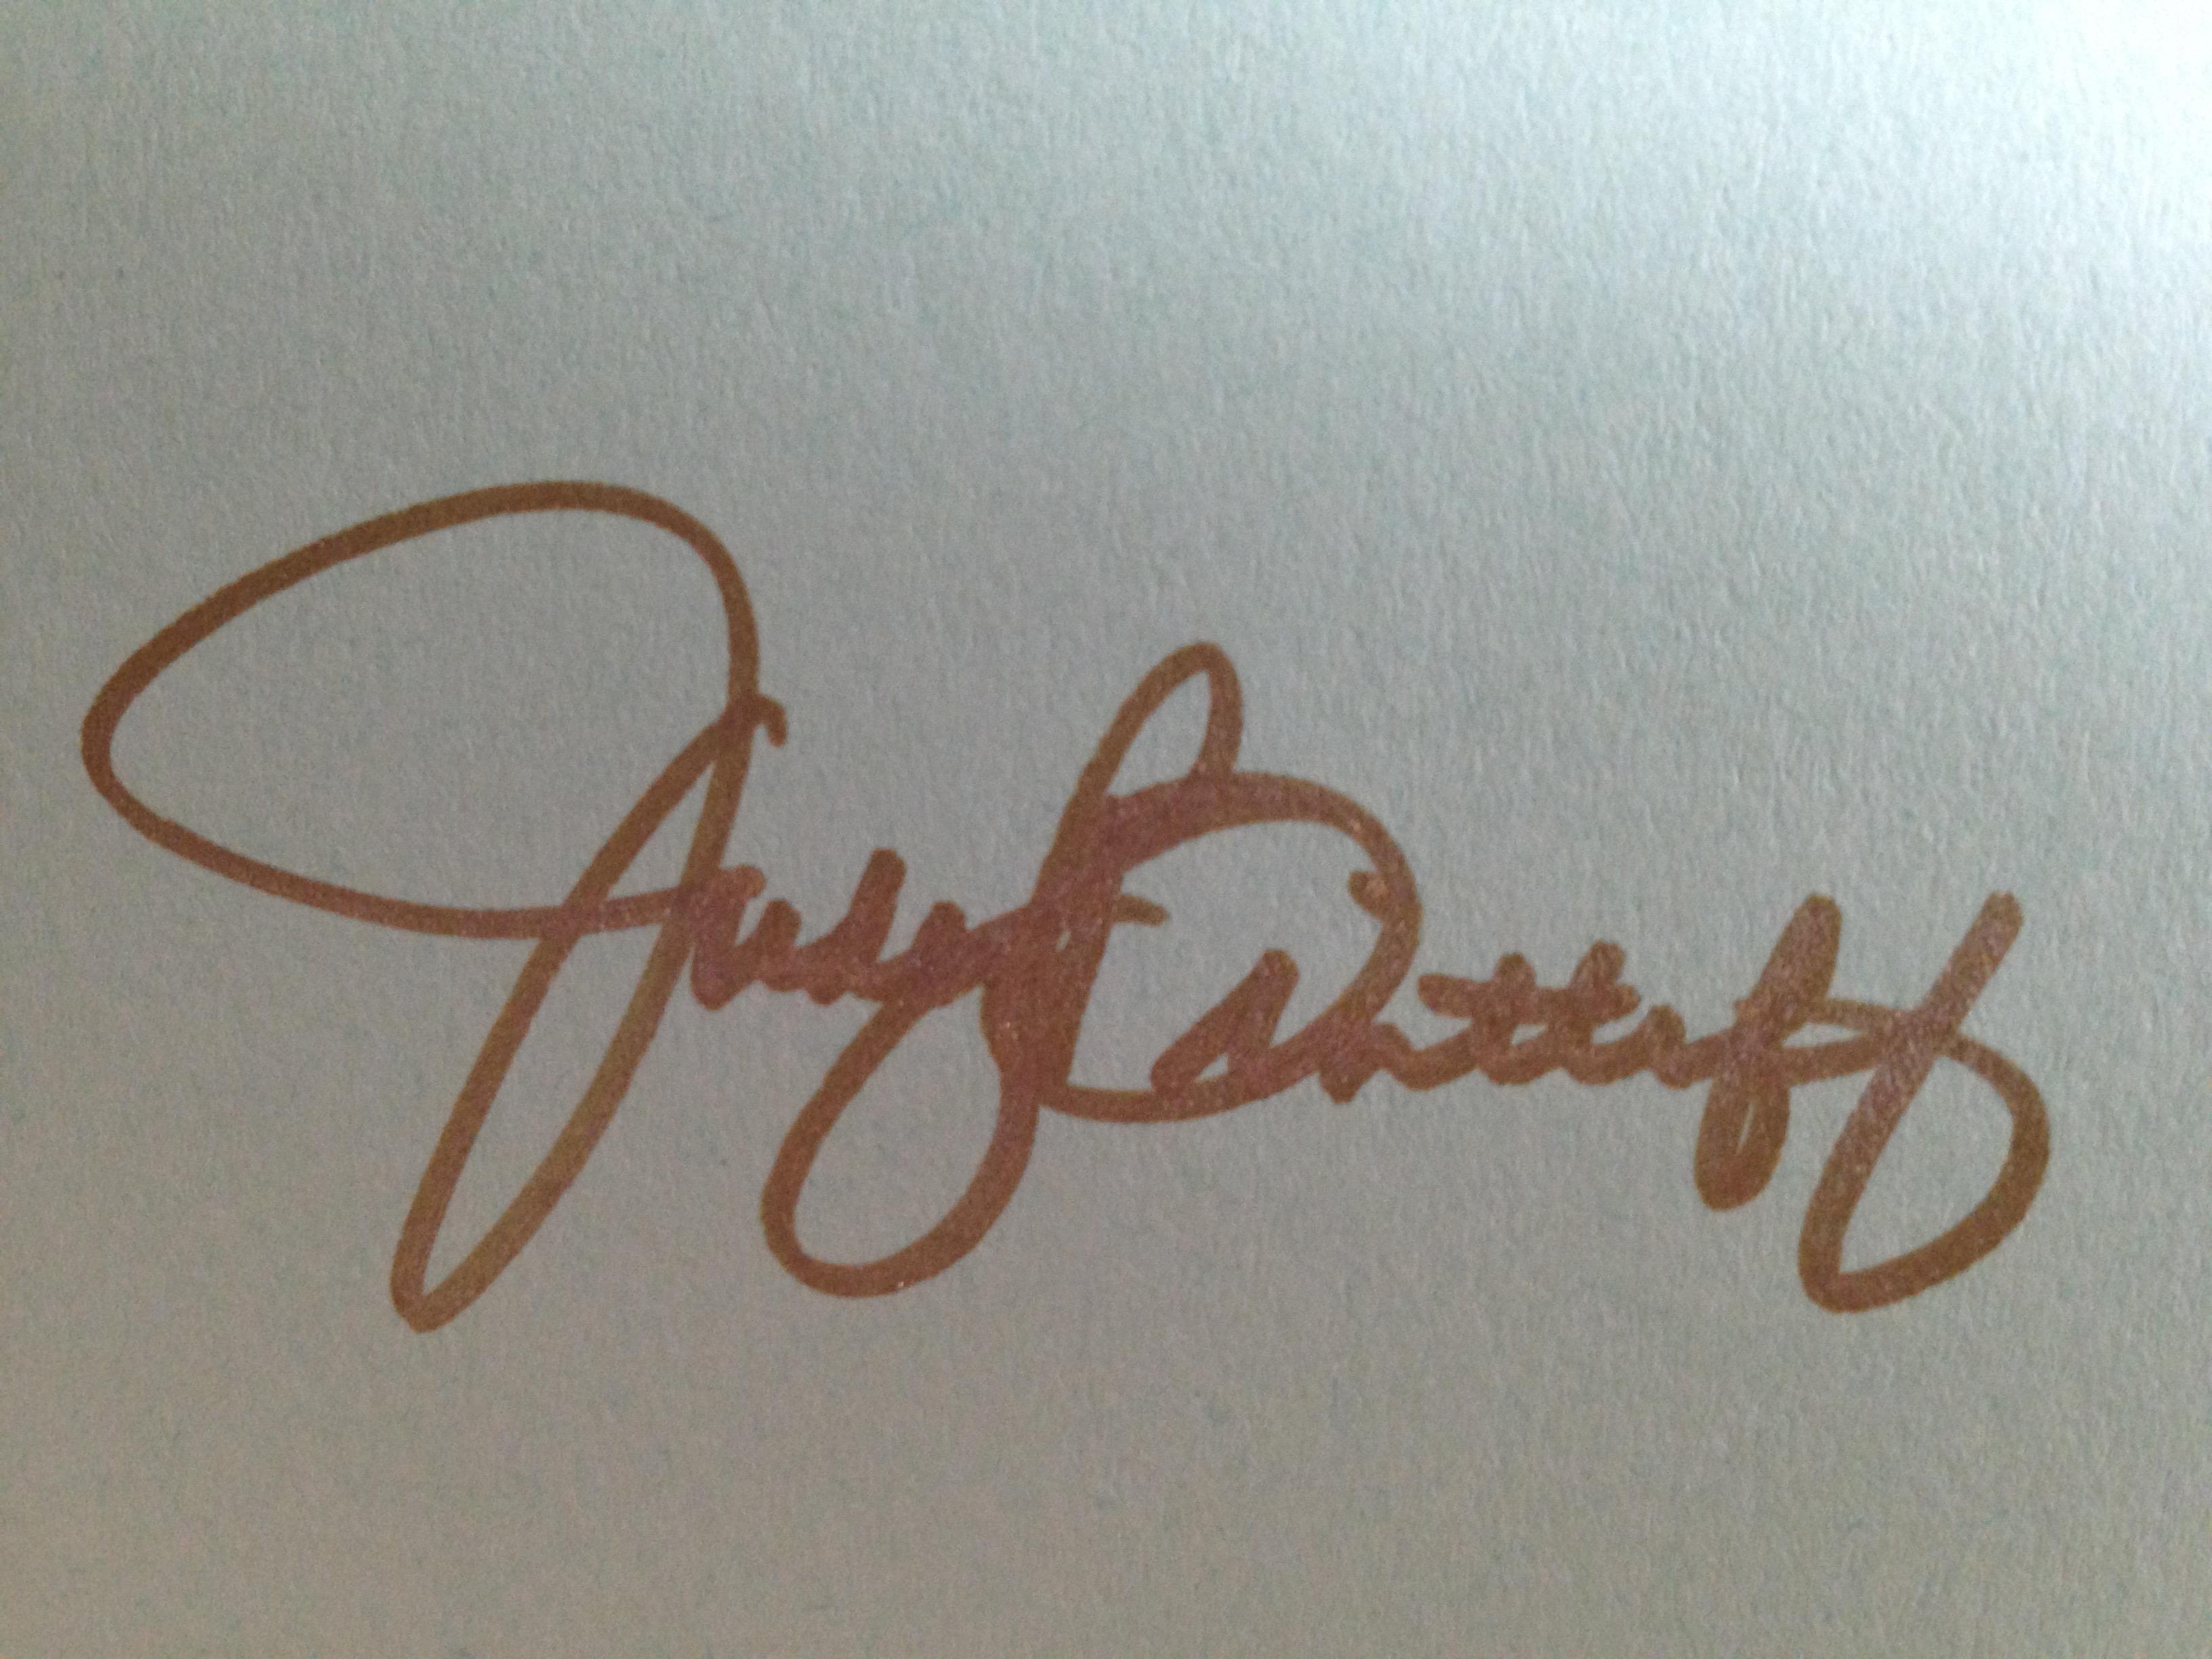 Judy Bintliff's Signature